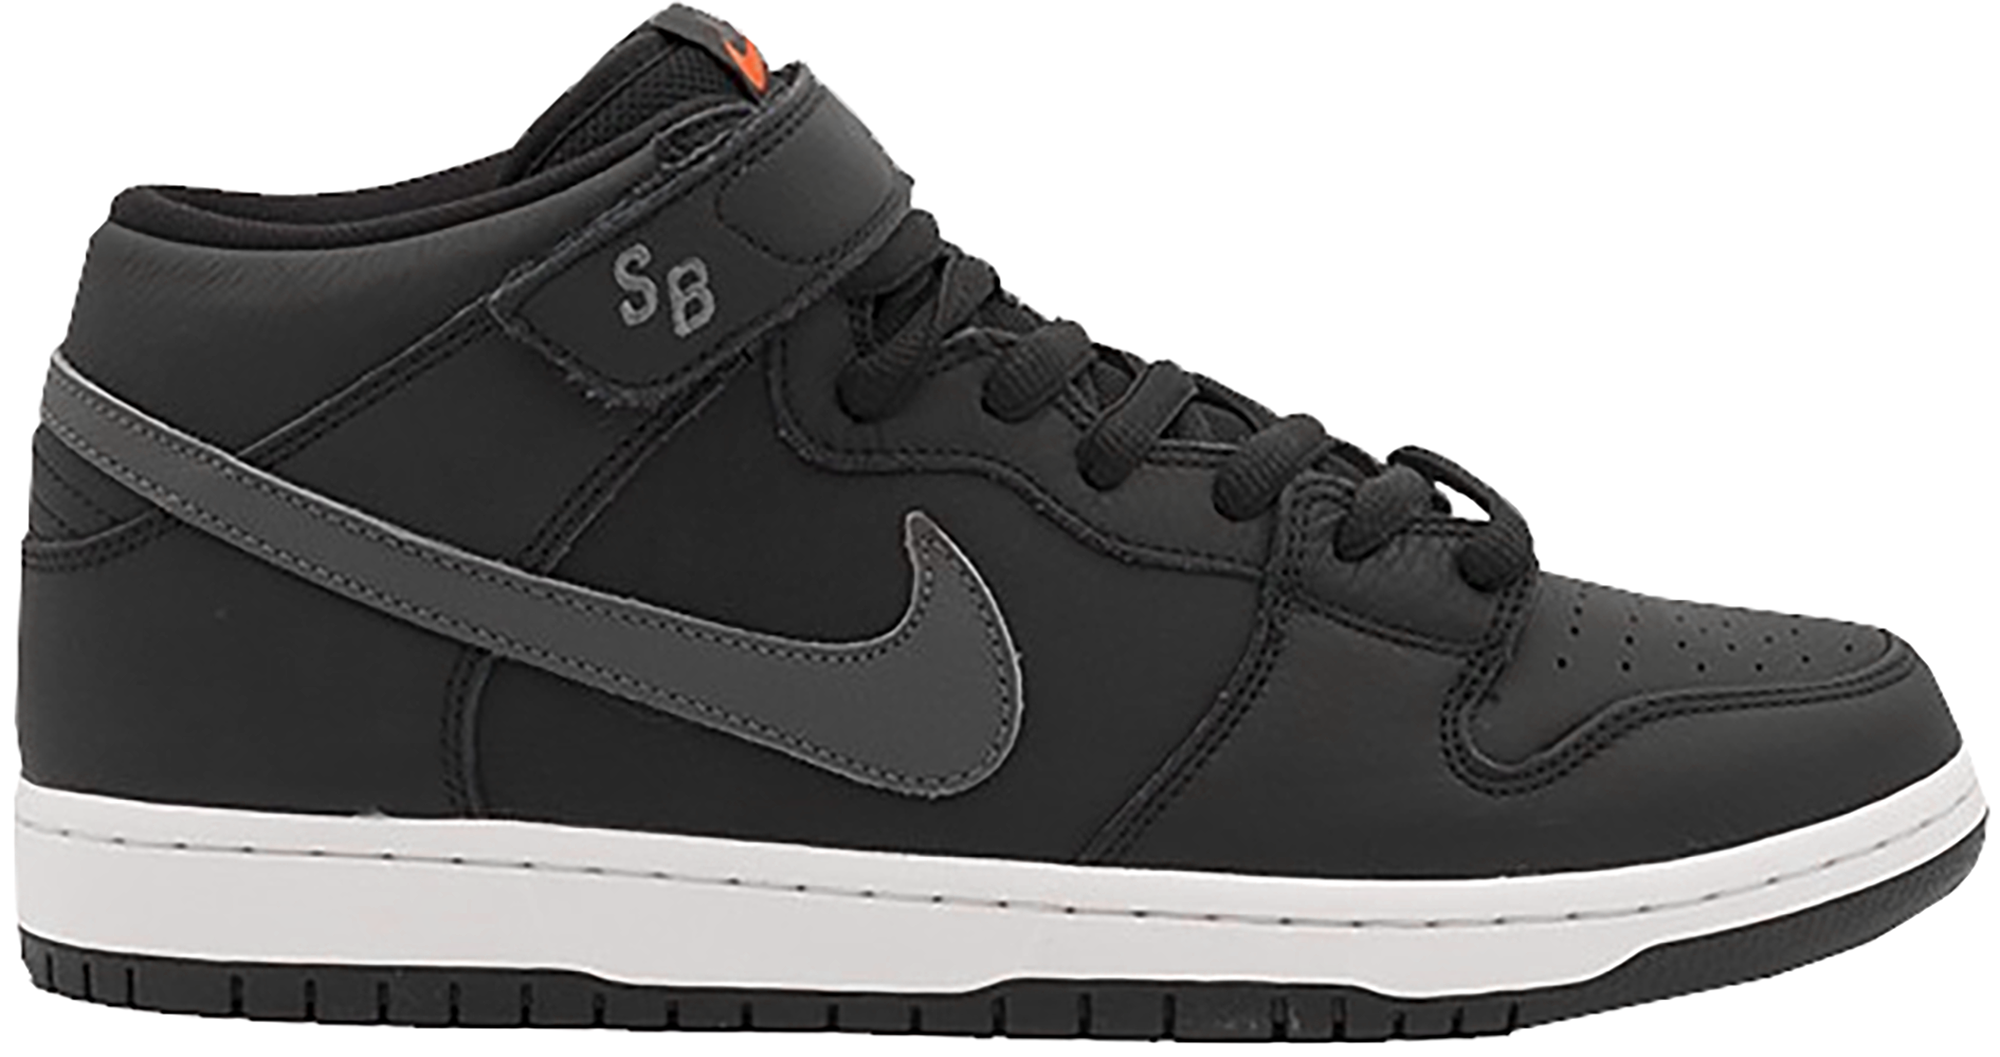 Nike SB Dunk Mid ISO Orange Label Black